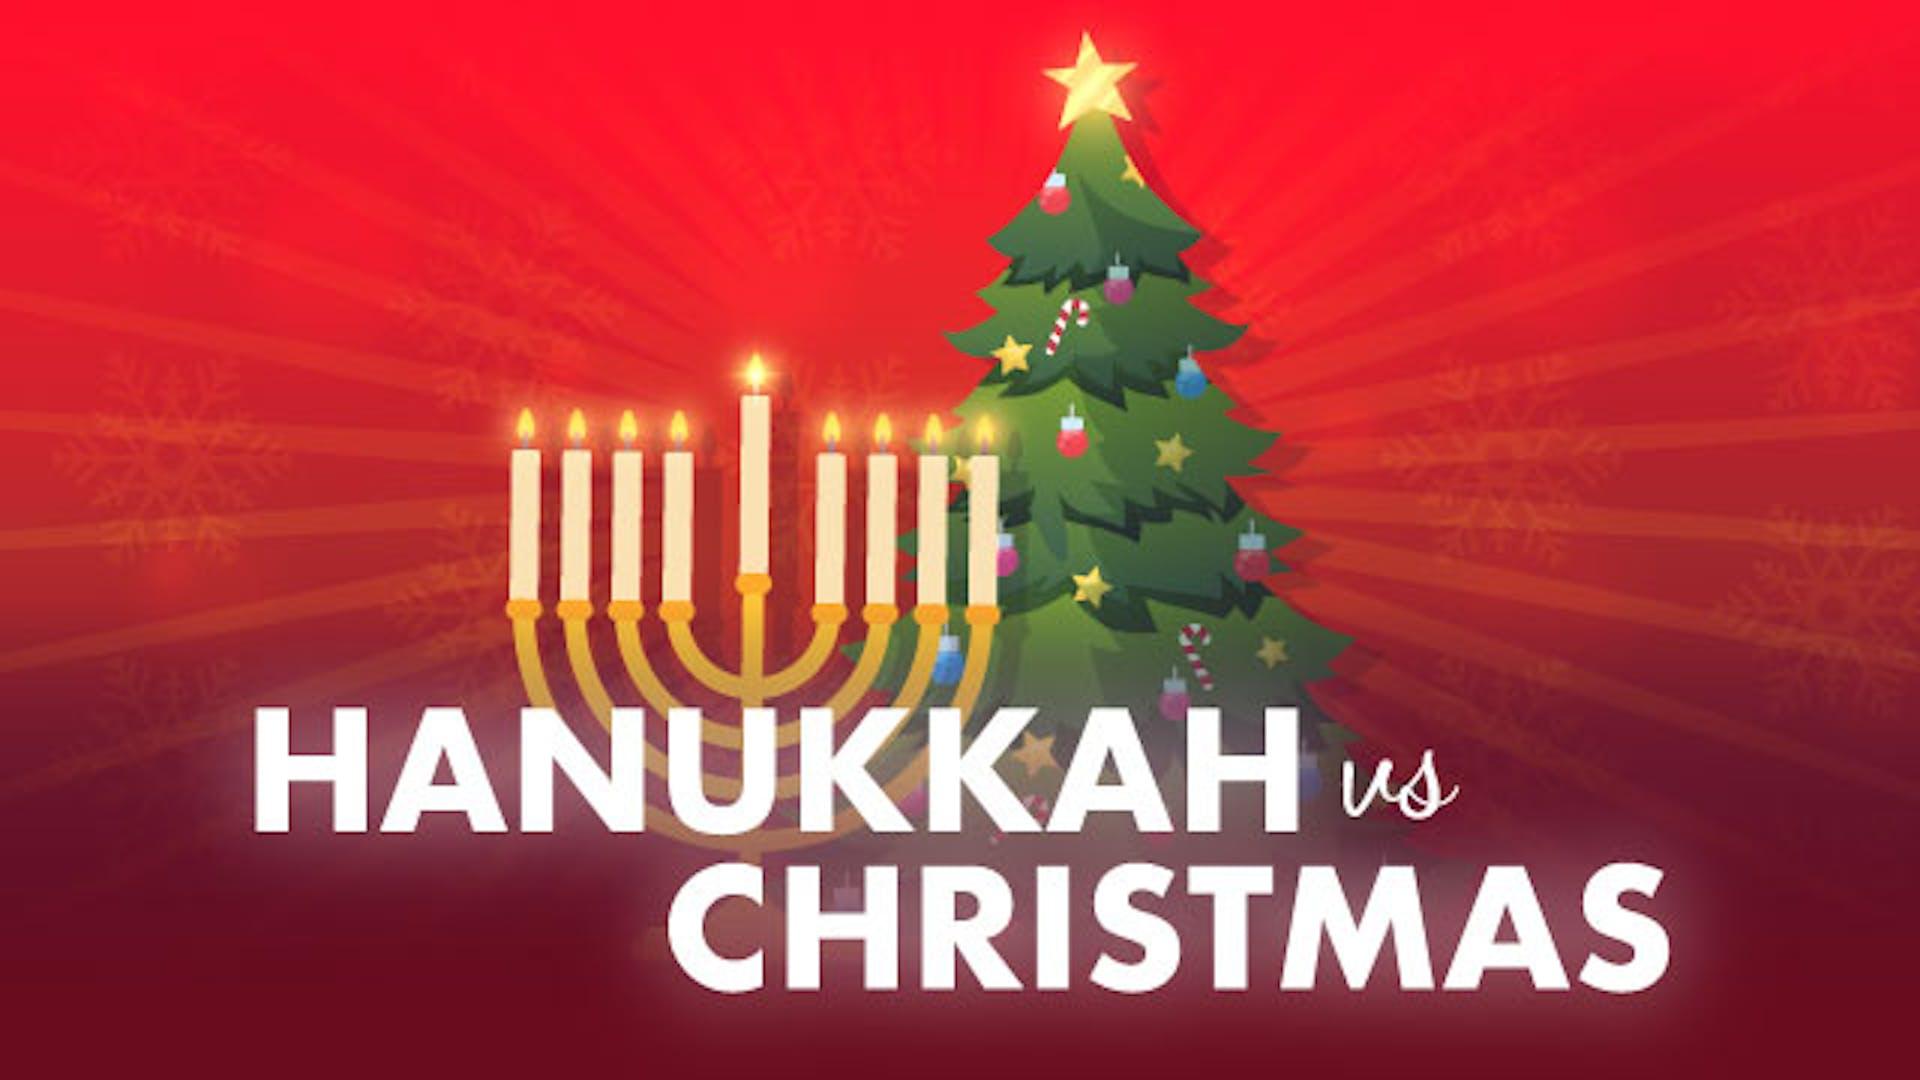 Hanukkah Christmas Winter Solstice holidays